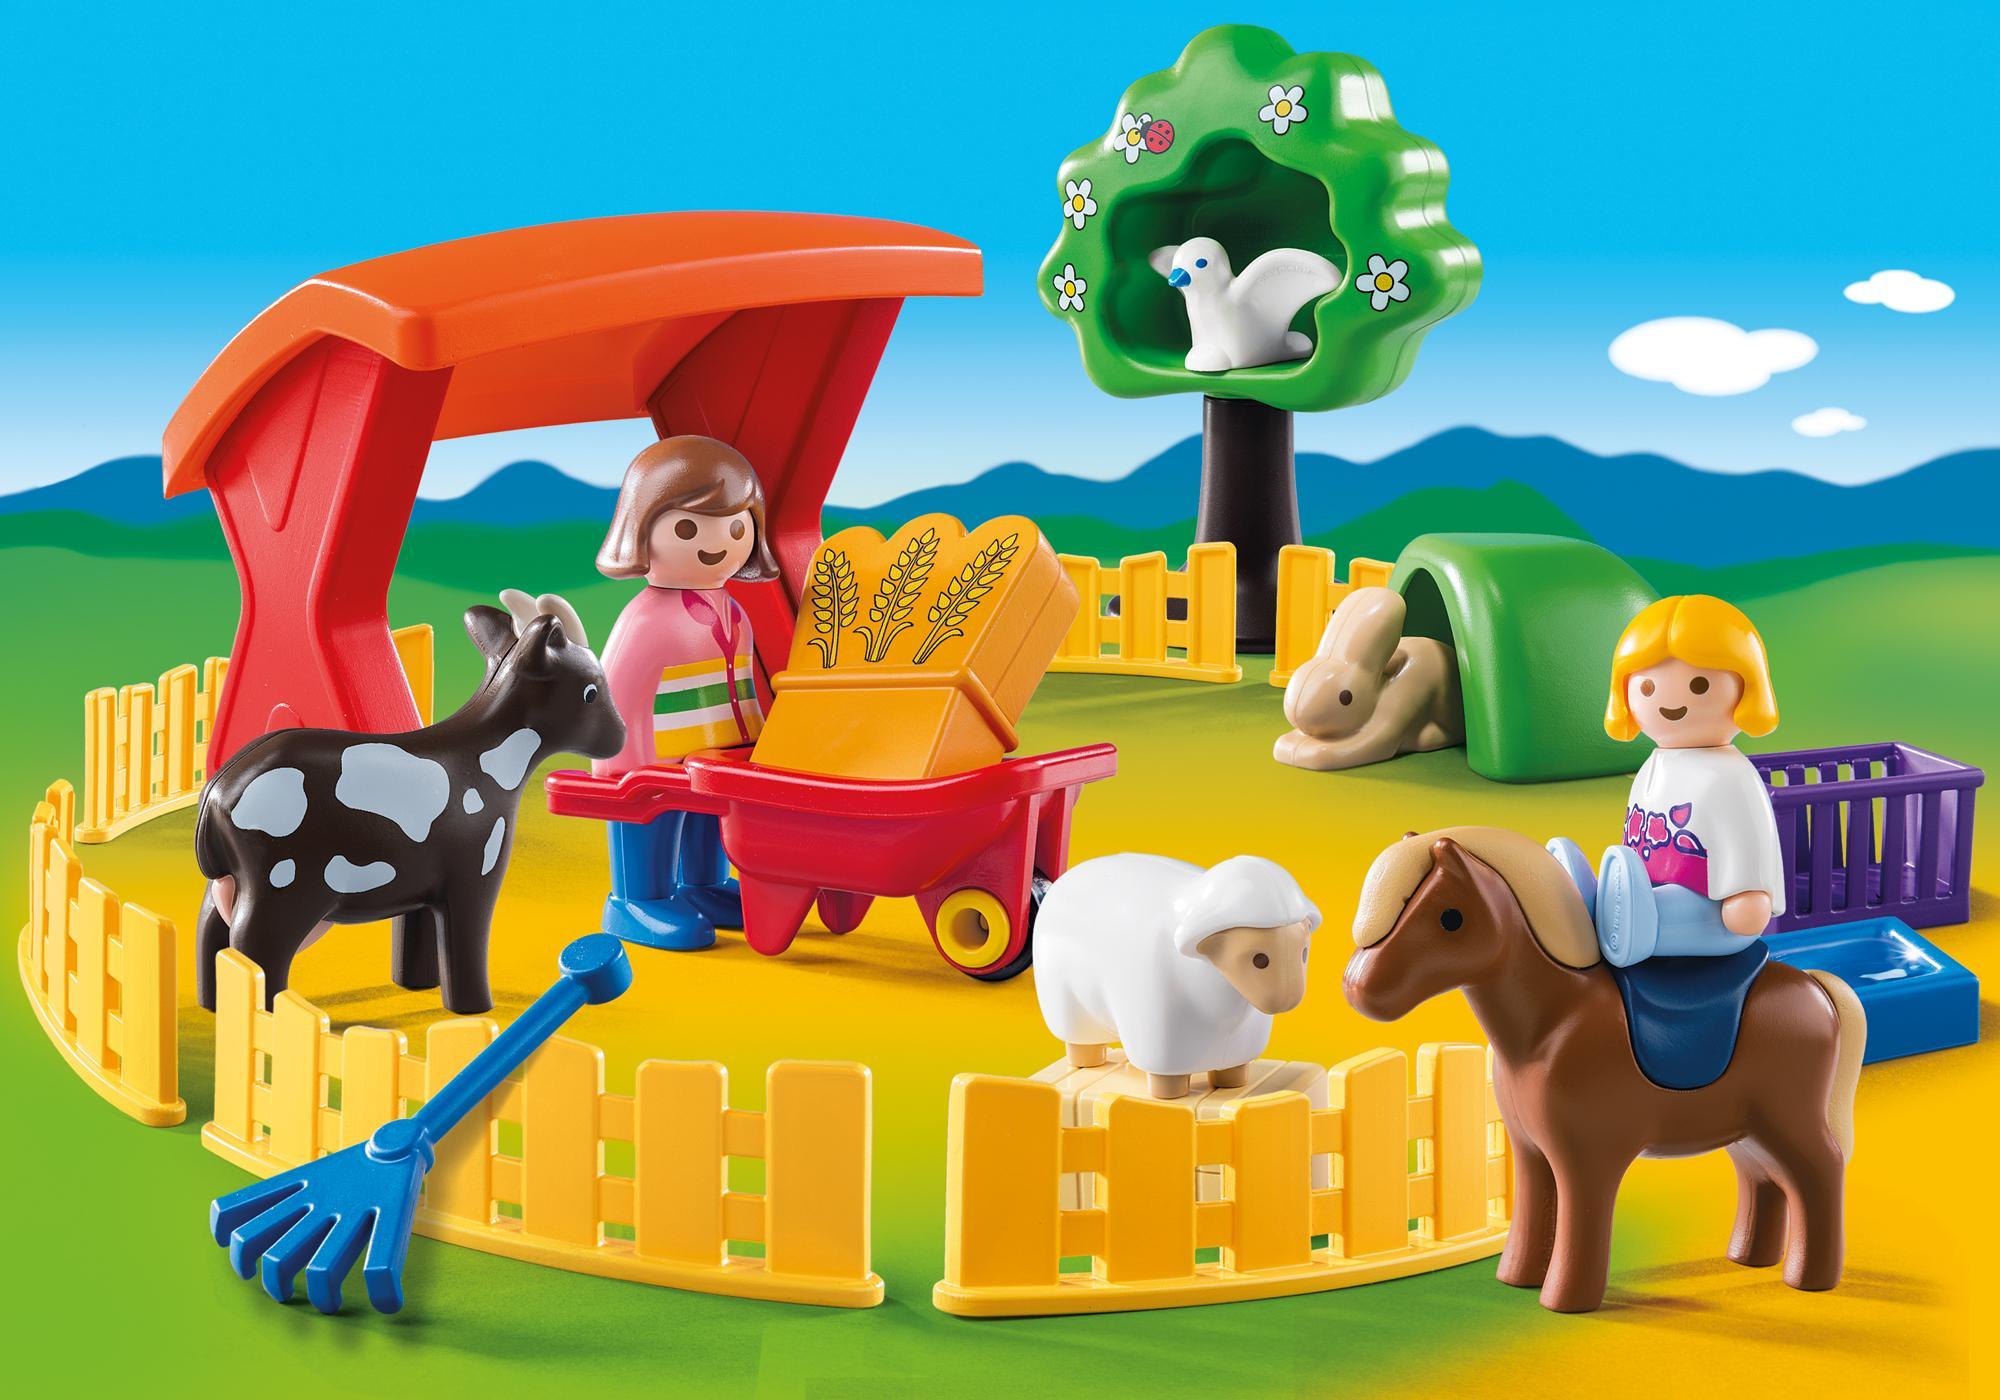 http://media.playmobil.com/i/playmobil/6963_product_detail/1.2.3 Recinto de Animales